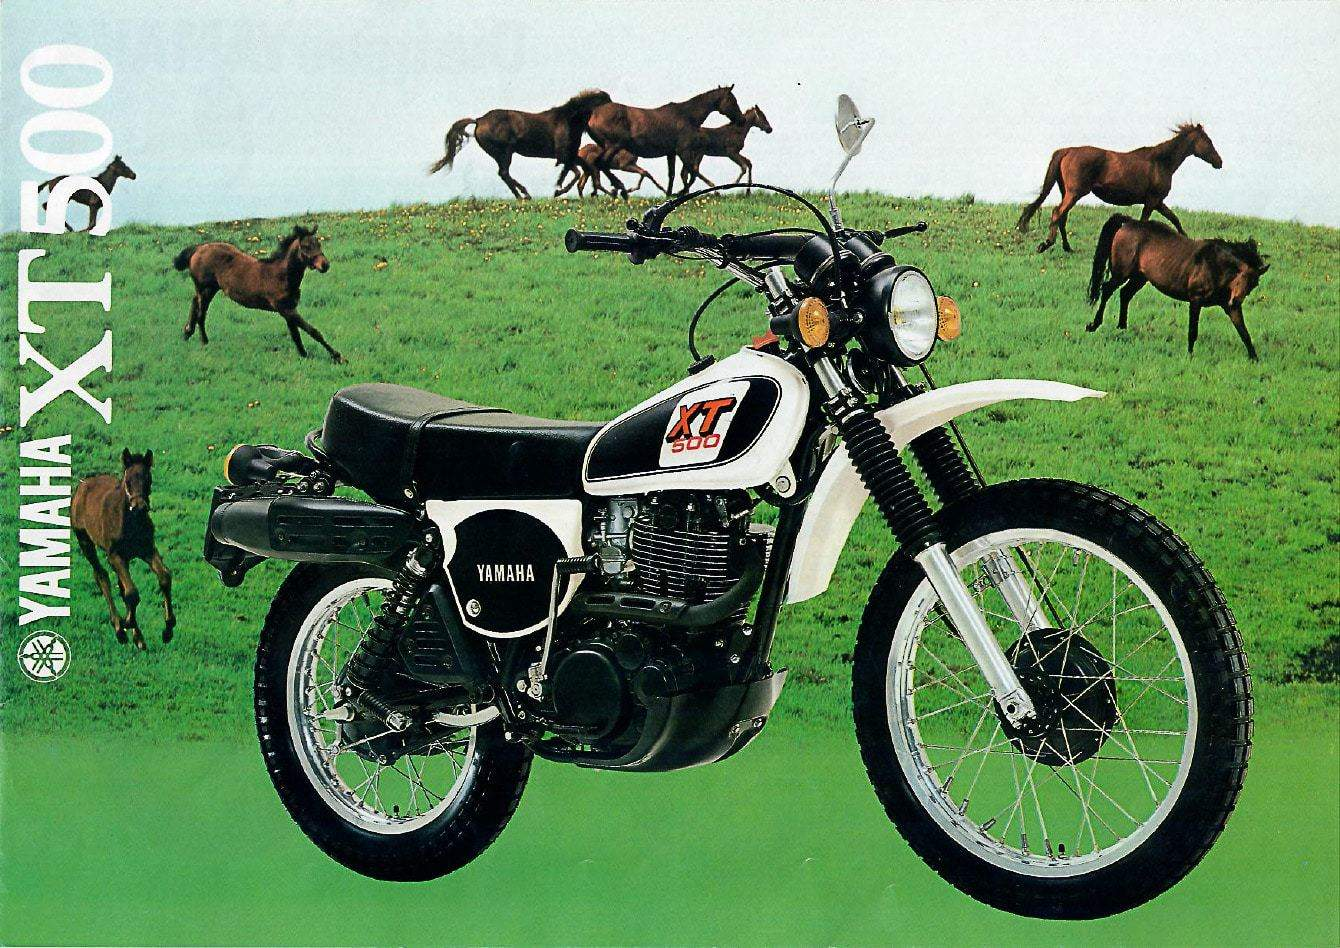 Yamaha XT 500 Prospekt 1979 - Das Original